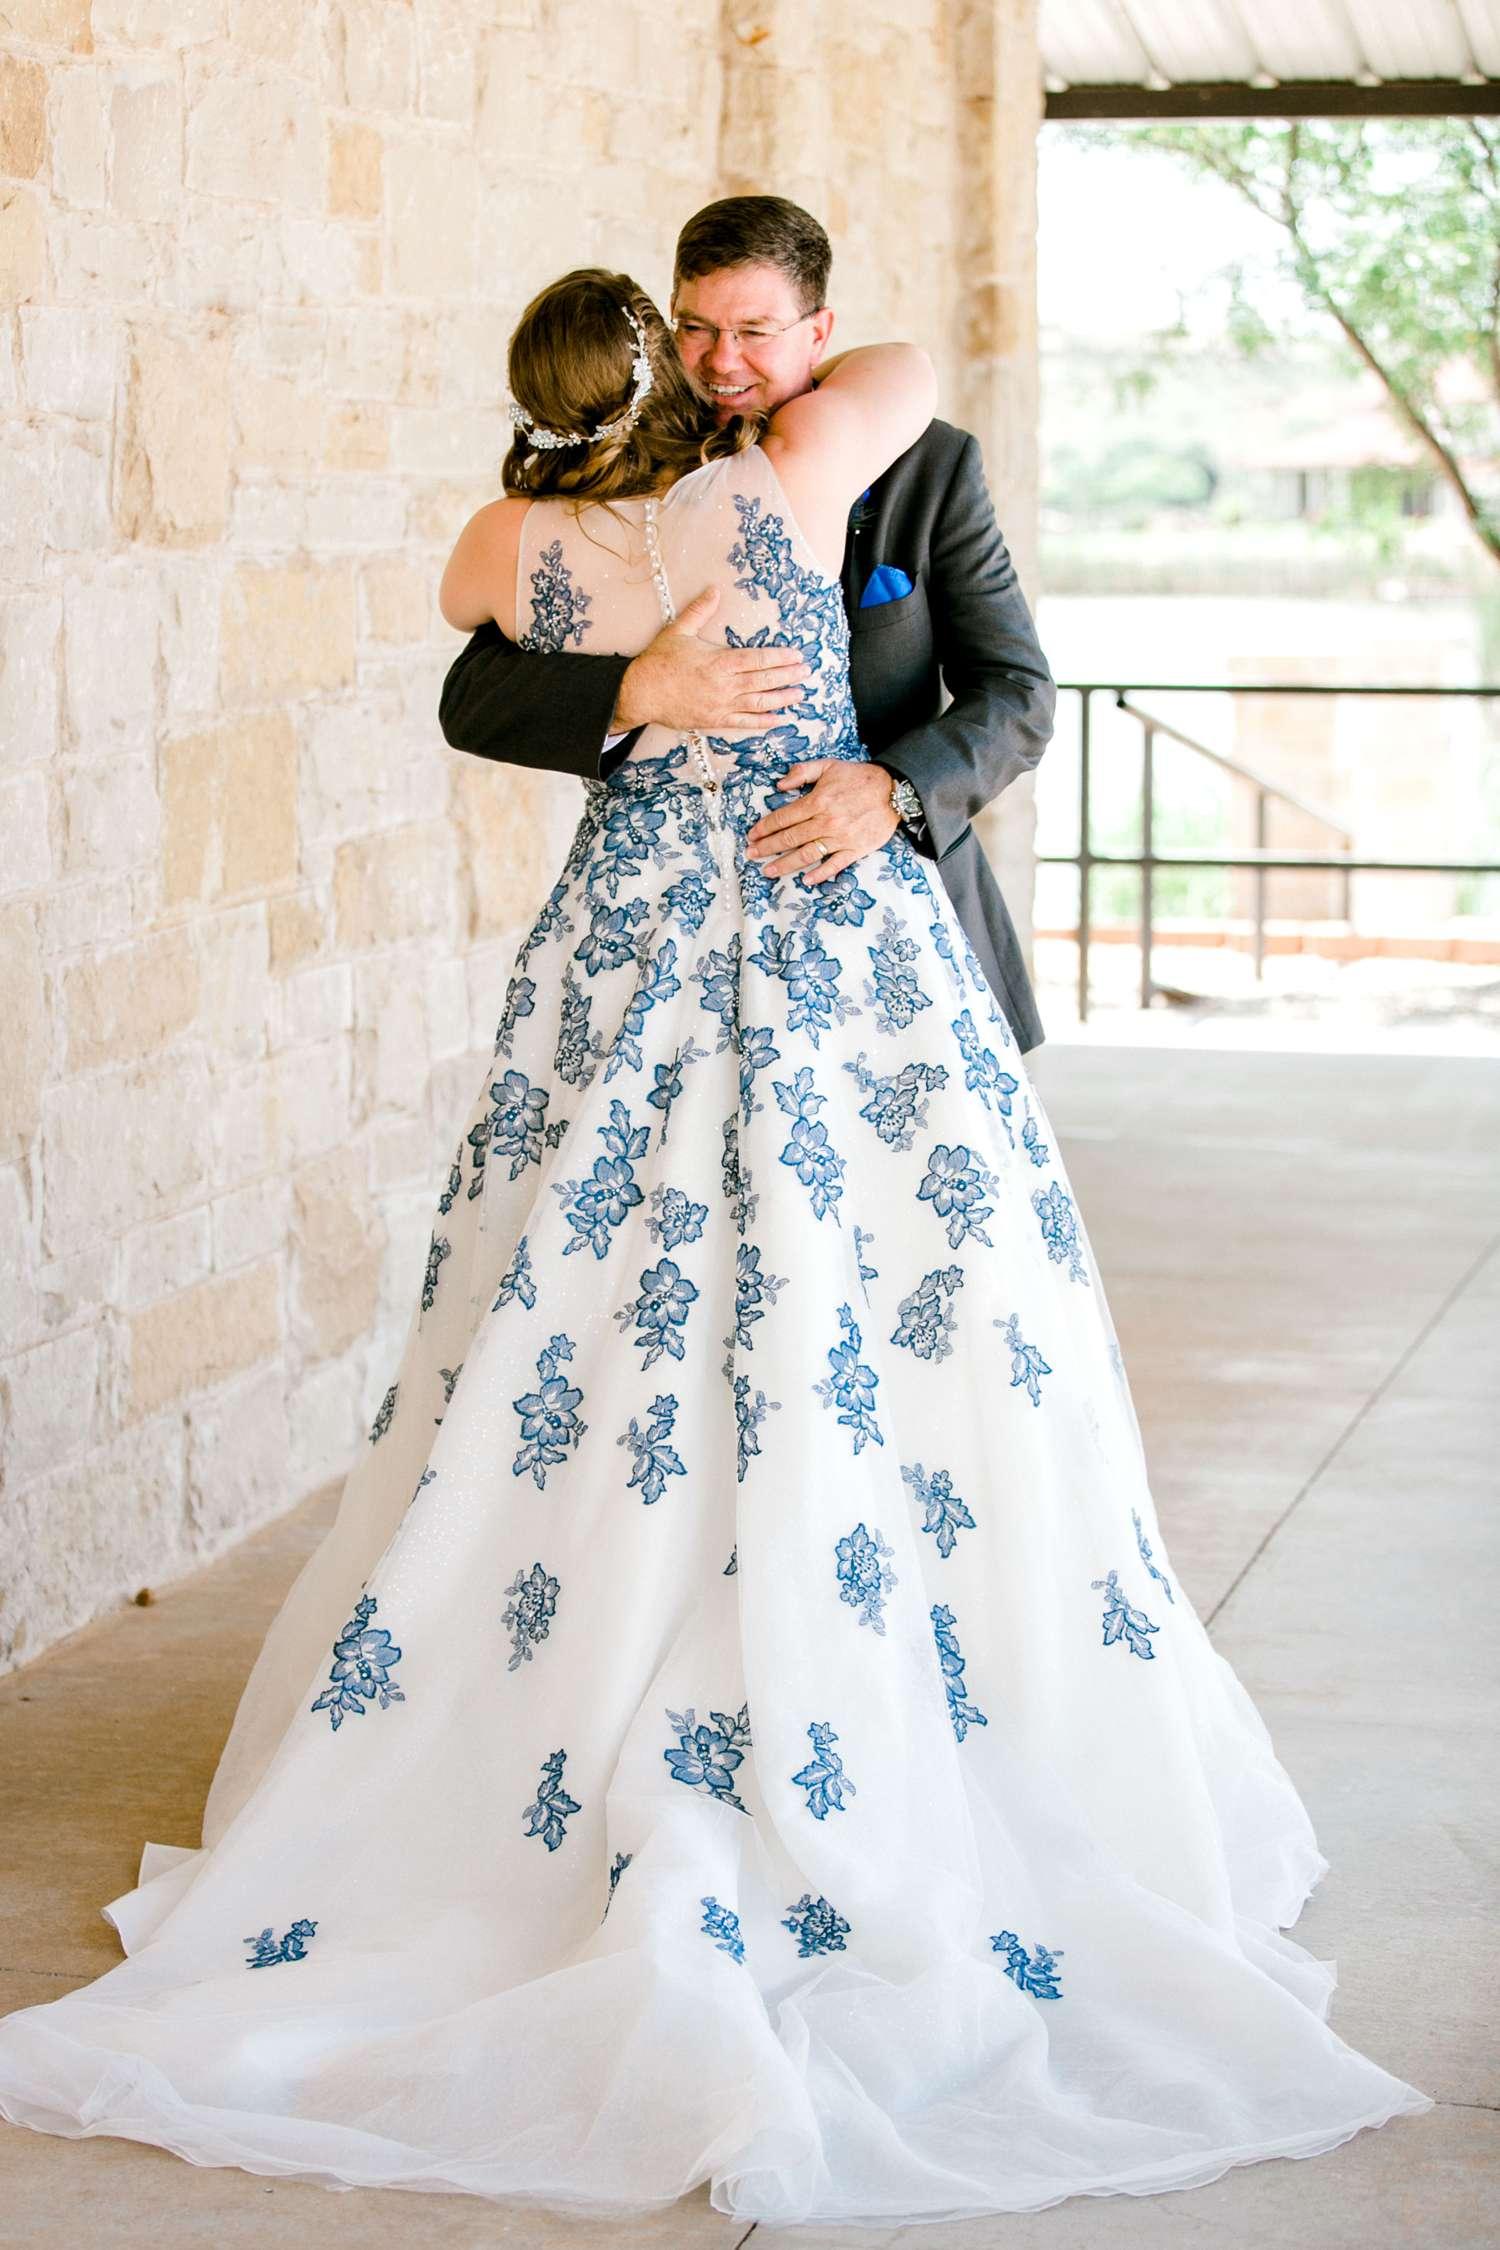 TY+NATHAN+HALLIER+ALLEEJ+WEDDING+PHOTOGRAPHER+RANSOM+CANYON_0020.jpg